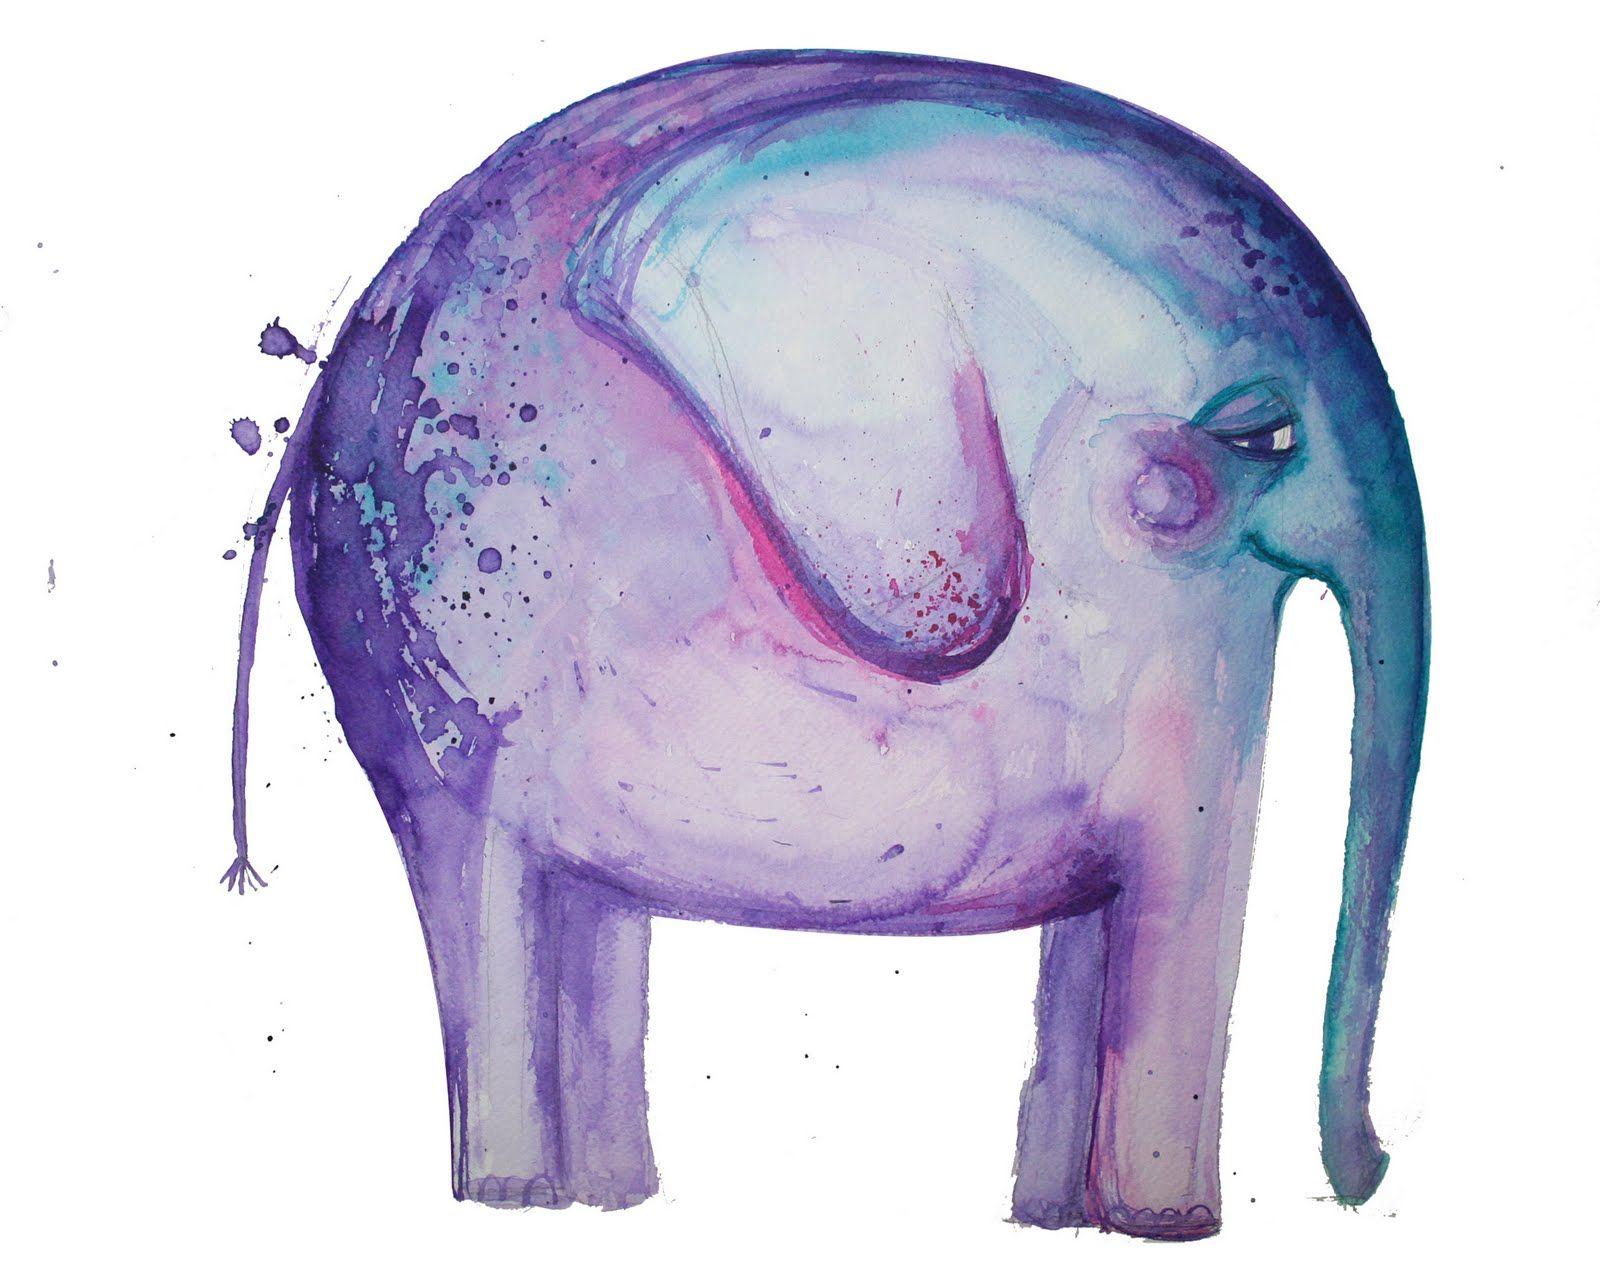 Pin By Ashley Herridge On Illustrations Animals Watercolor Elephant Elephant Art Animal Illustration